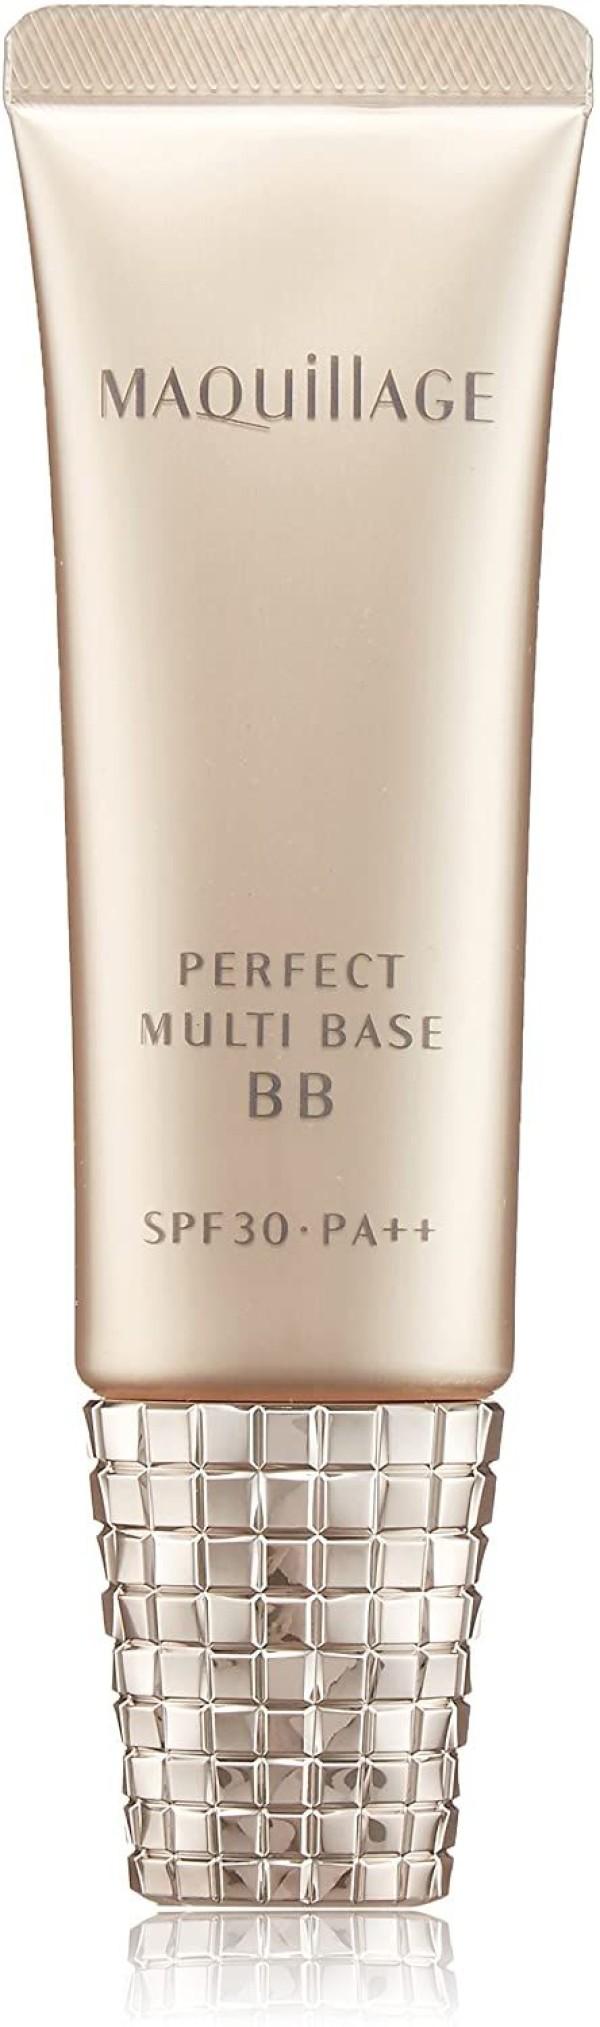 Мульти - основа под макияж SHISEIDO MAQUILLAGE Perfect Multi Base BB SPF 30 PA++